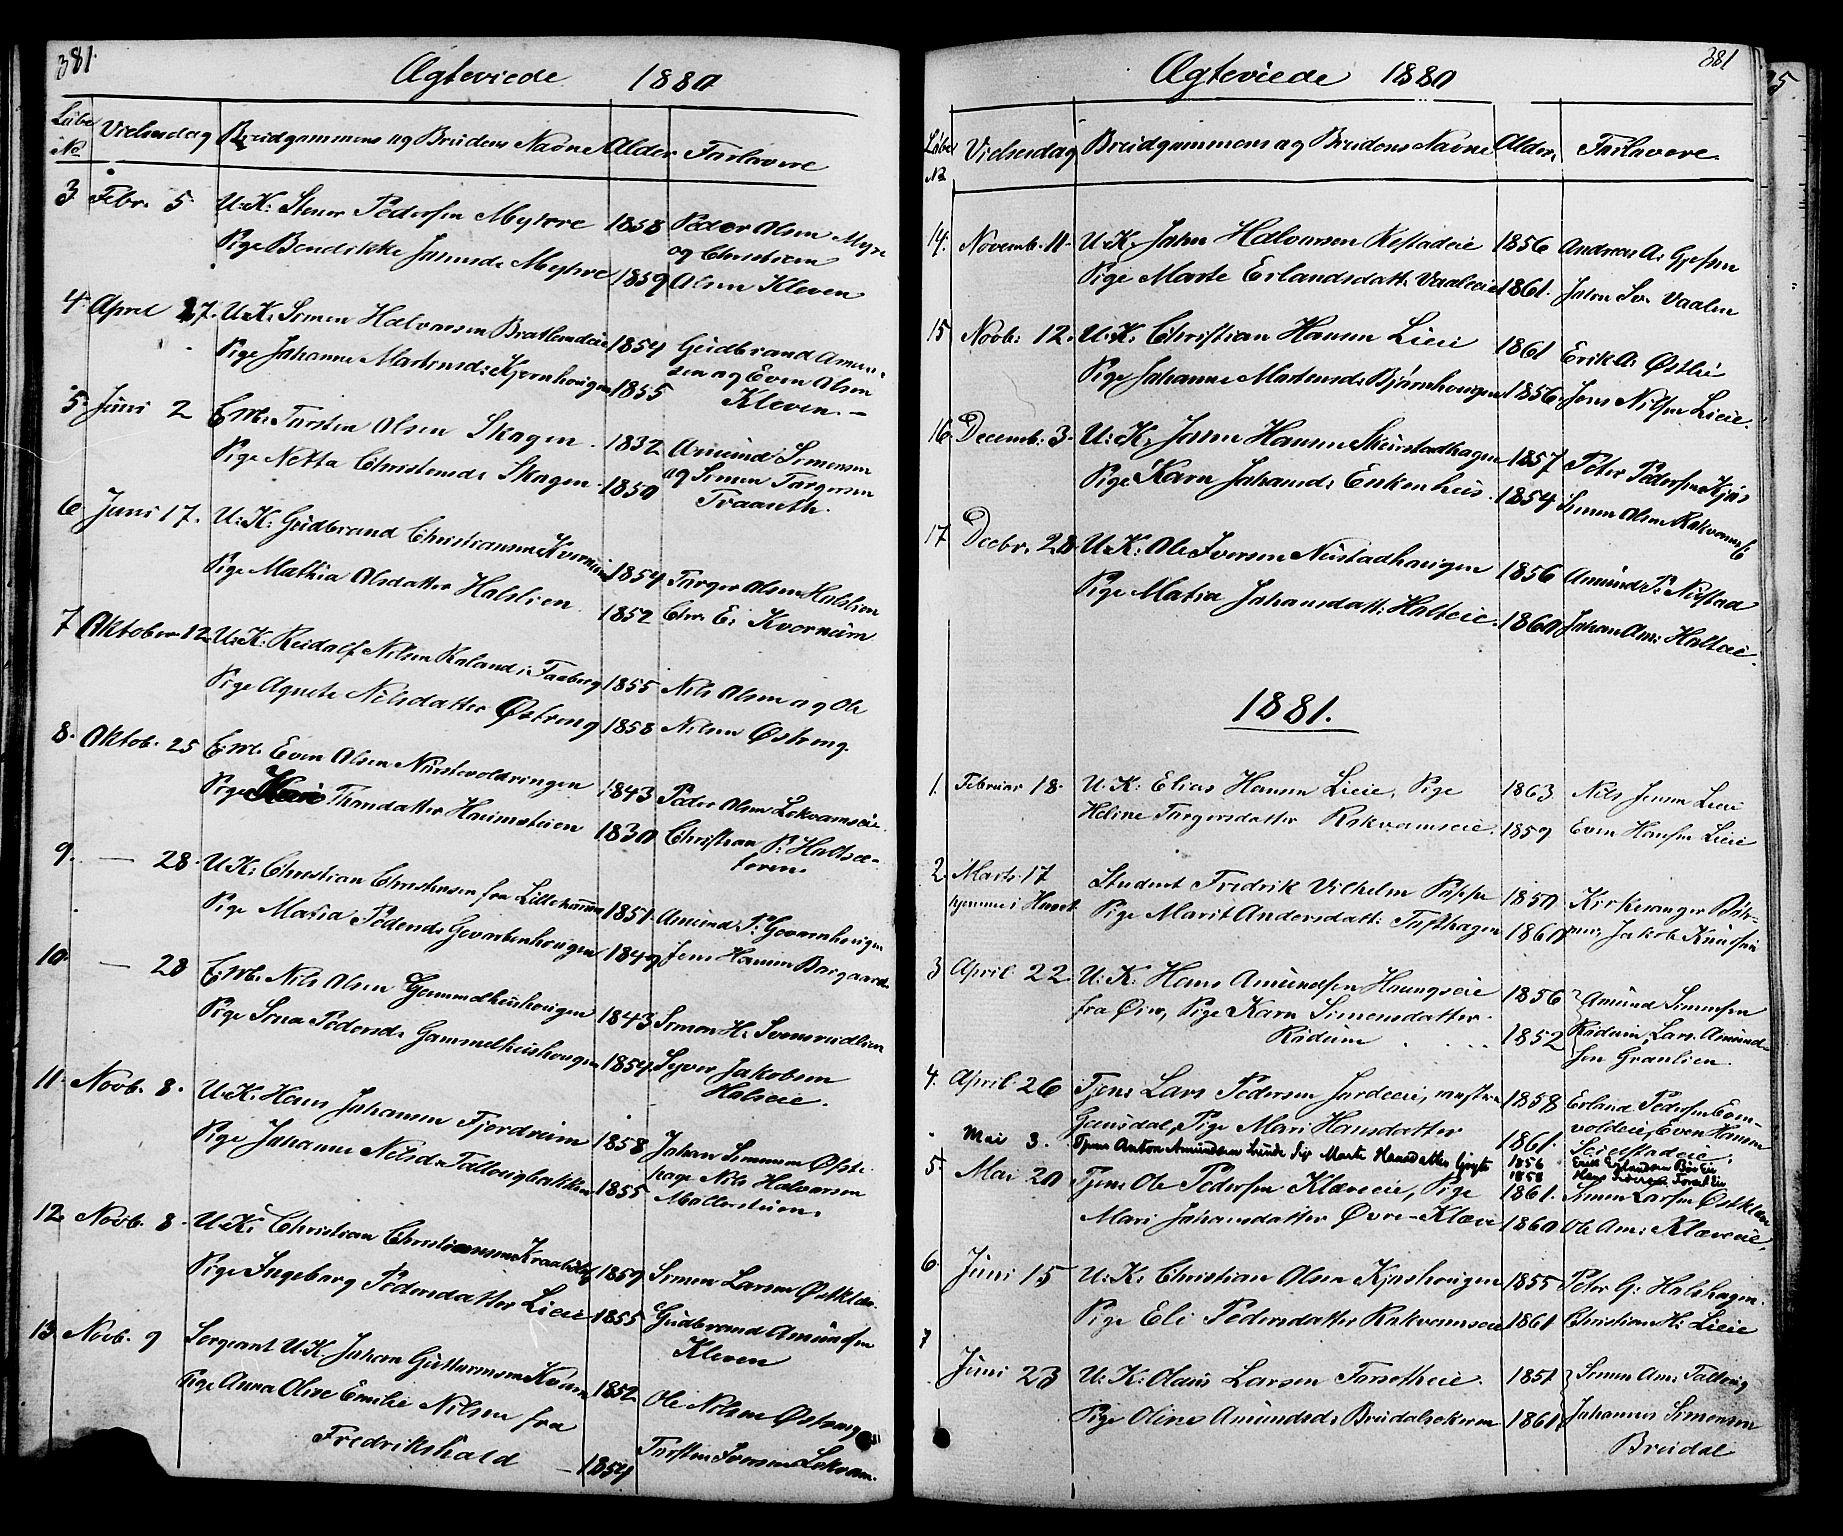 SAH, Østre Gausdal prestekontor, Klokkerbok nr. 1, 1863-1893, s. 381-382